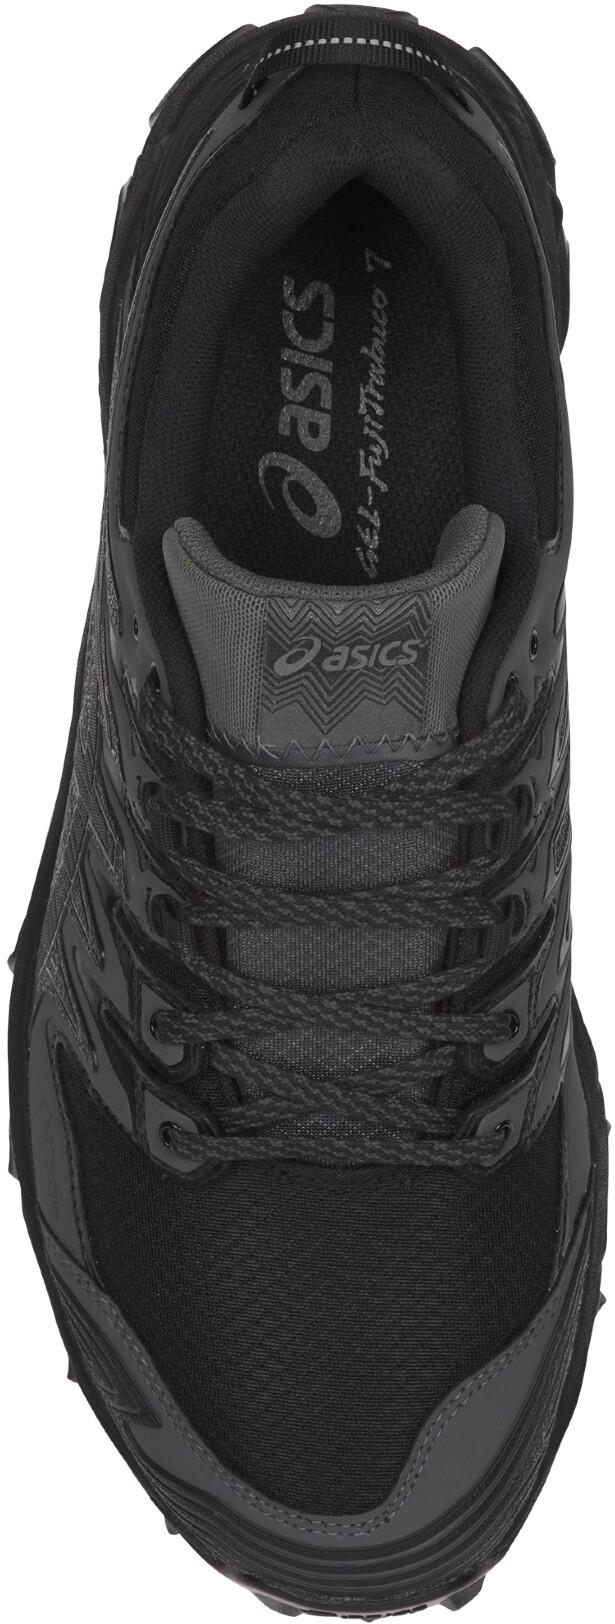 Tx G Chaussures HommeBlackdark Gel Fujitrabuco Asics Grey 7 O8PwXkn0